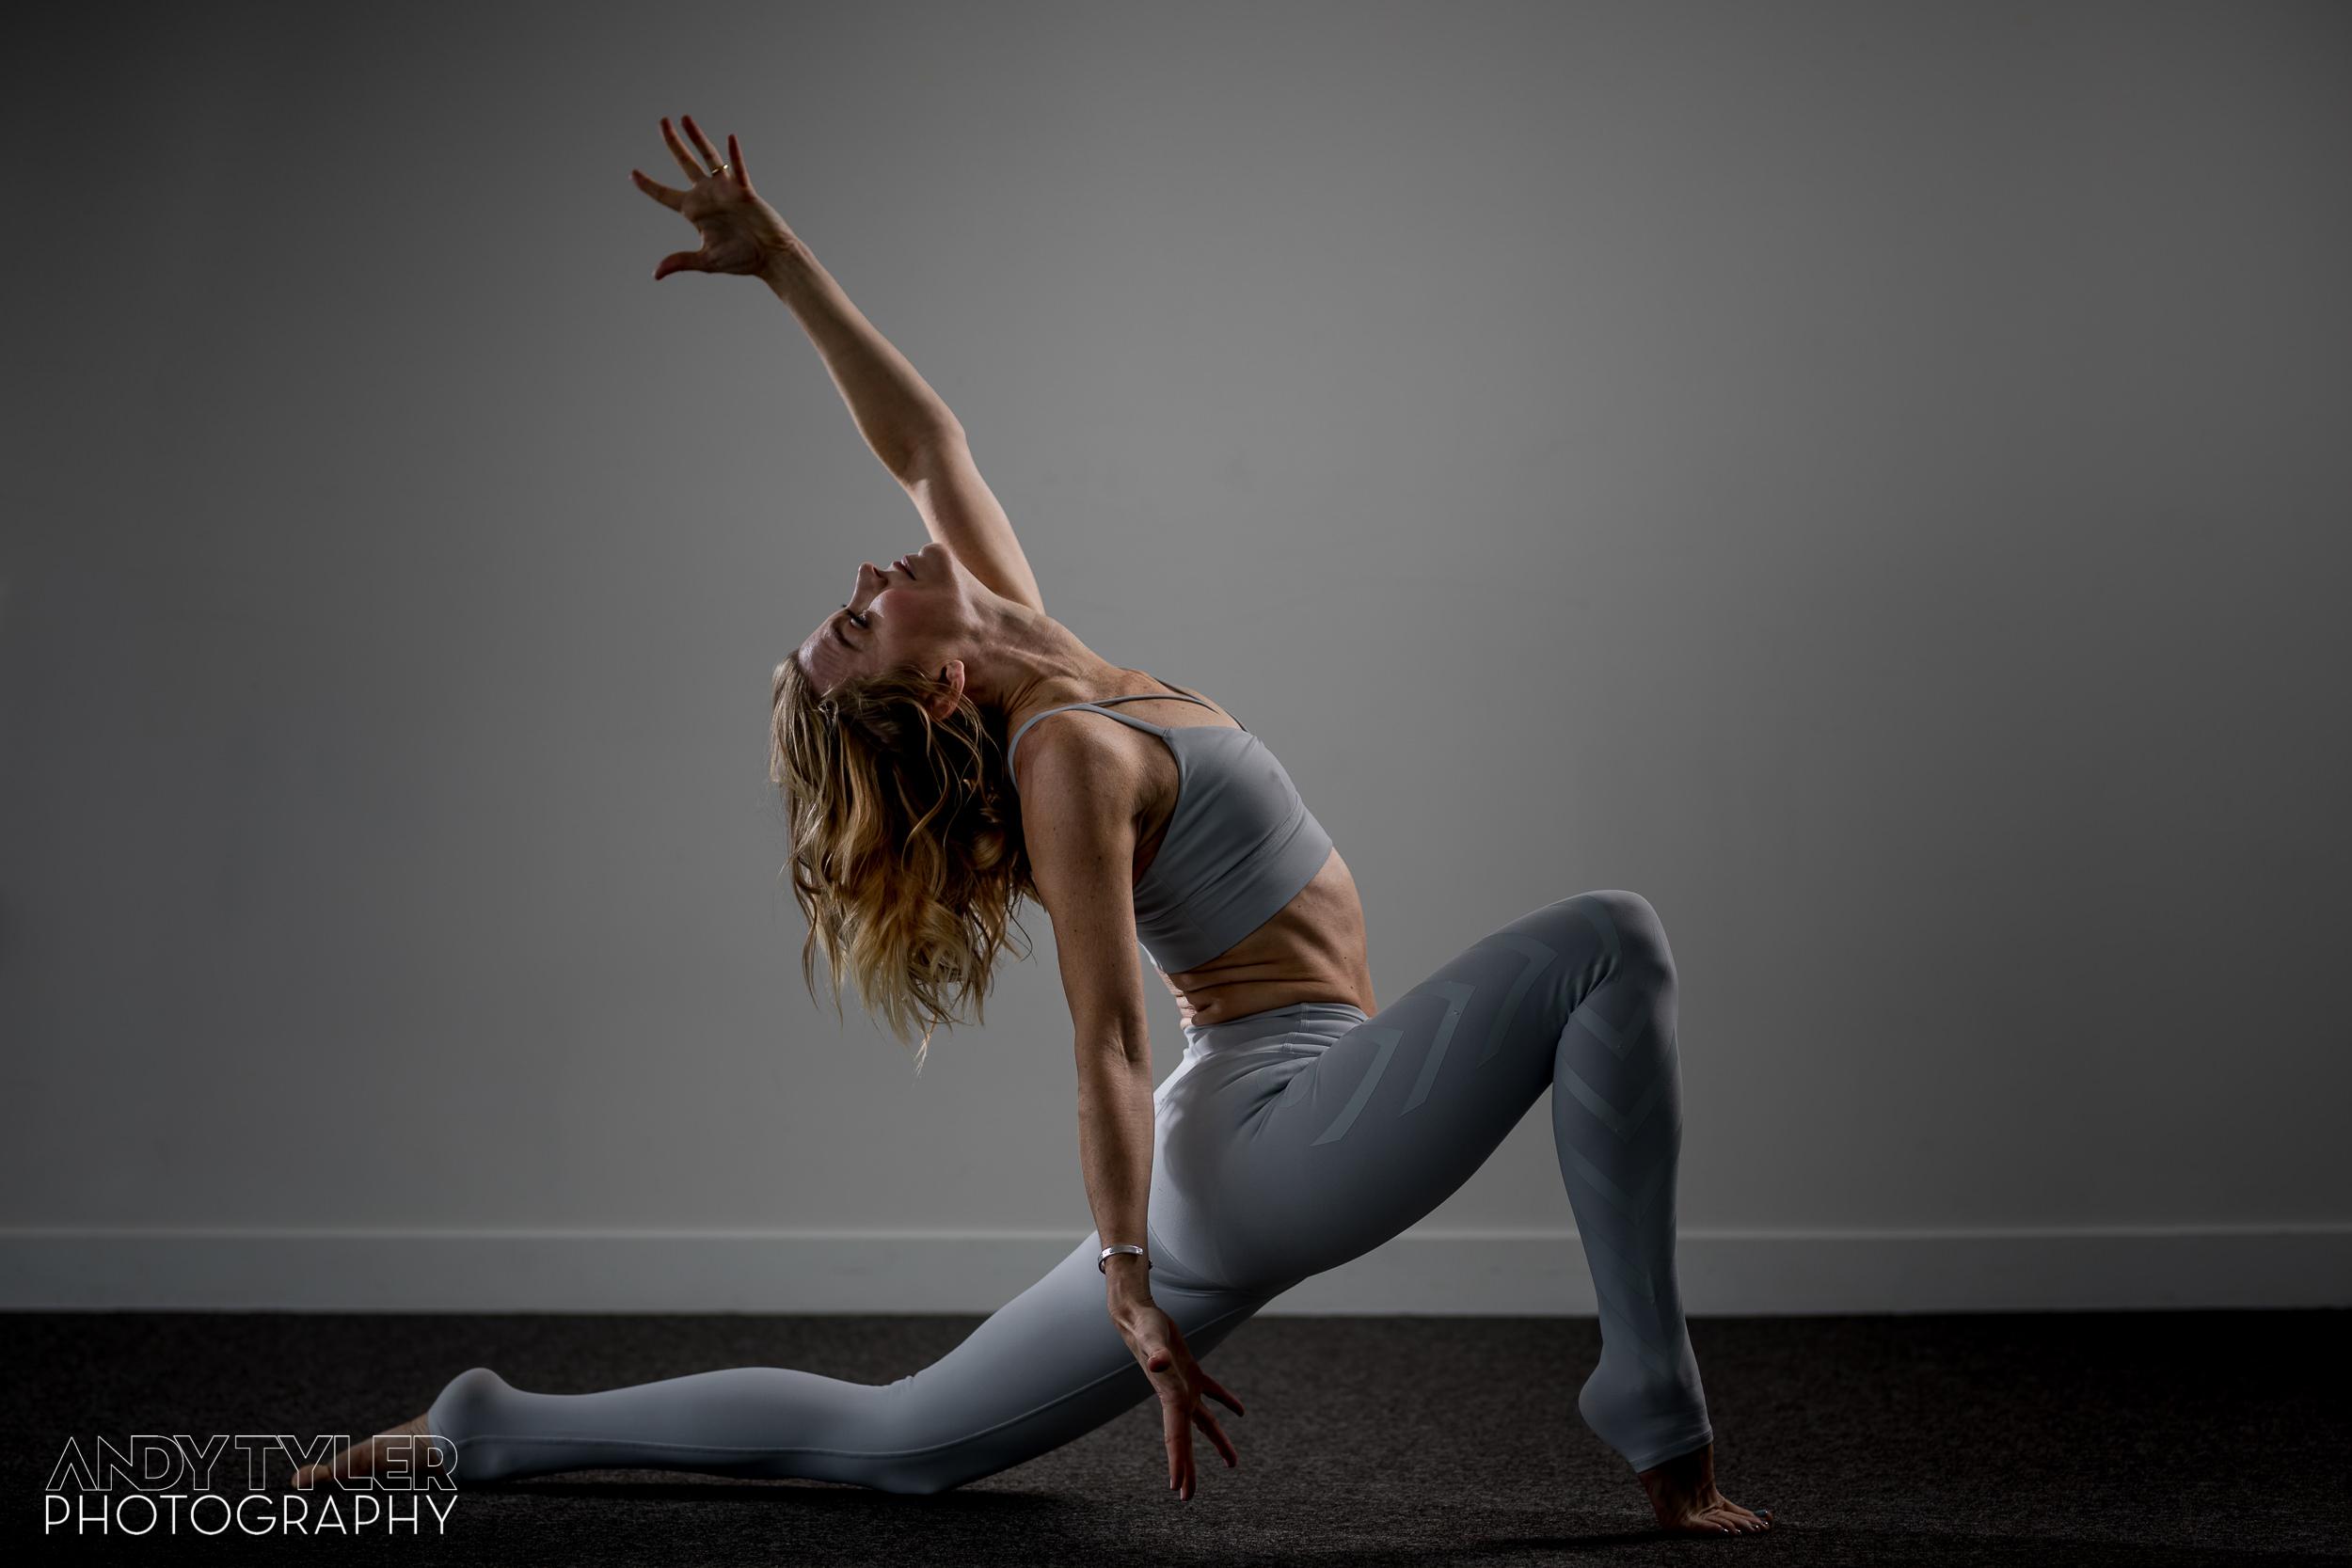 Andy_Tyler_Photography_Yoga_School_013_Andy_Tyler_Photography_JM_School_of_Yoga_047_5DA_0855.jpg